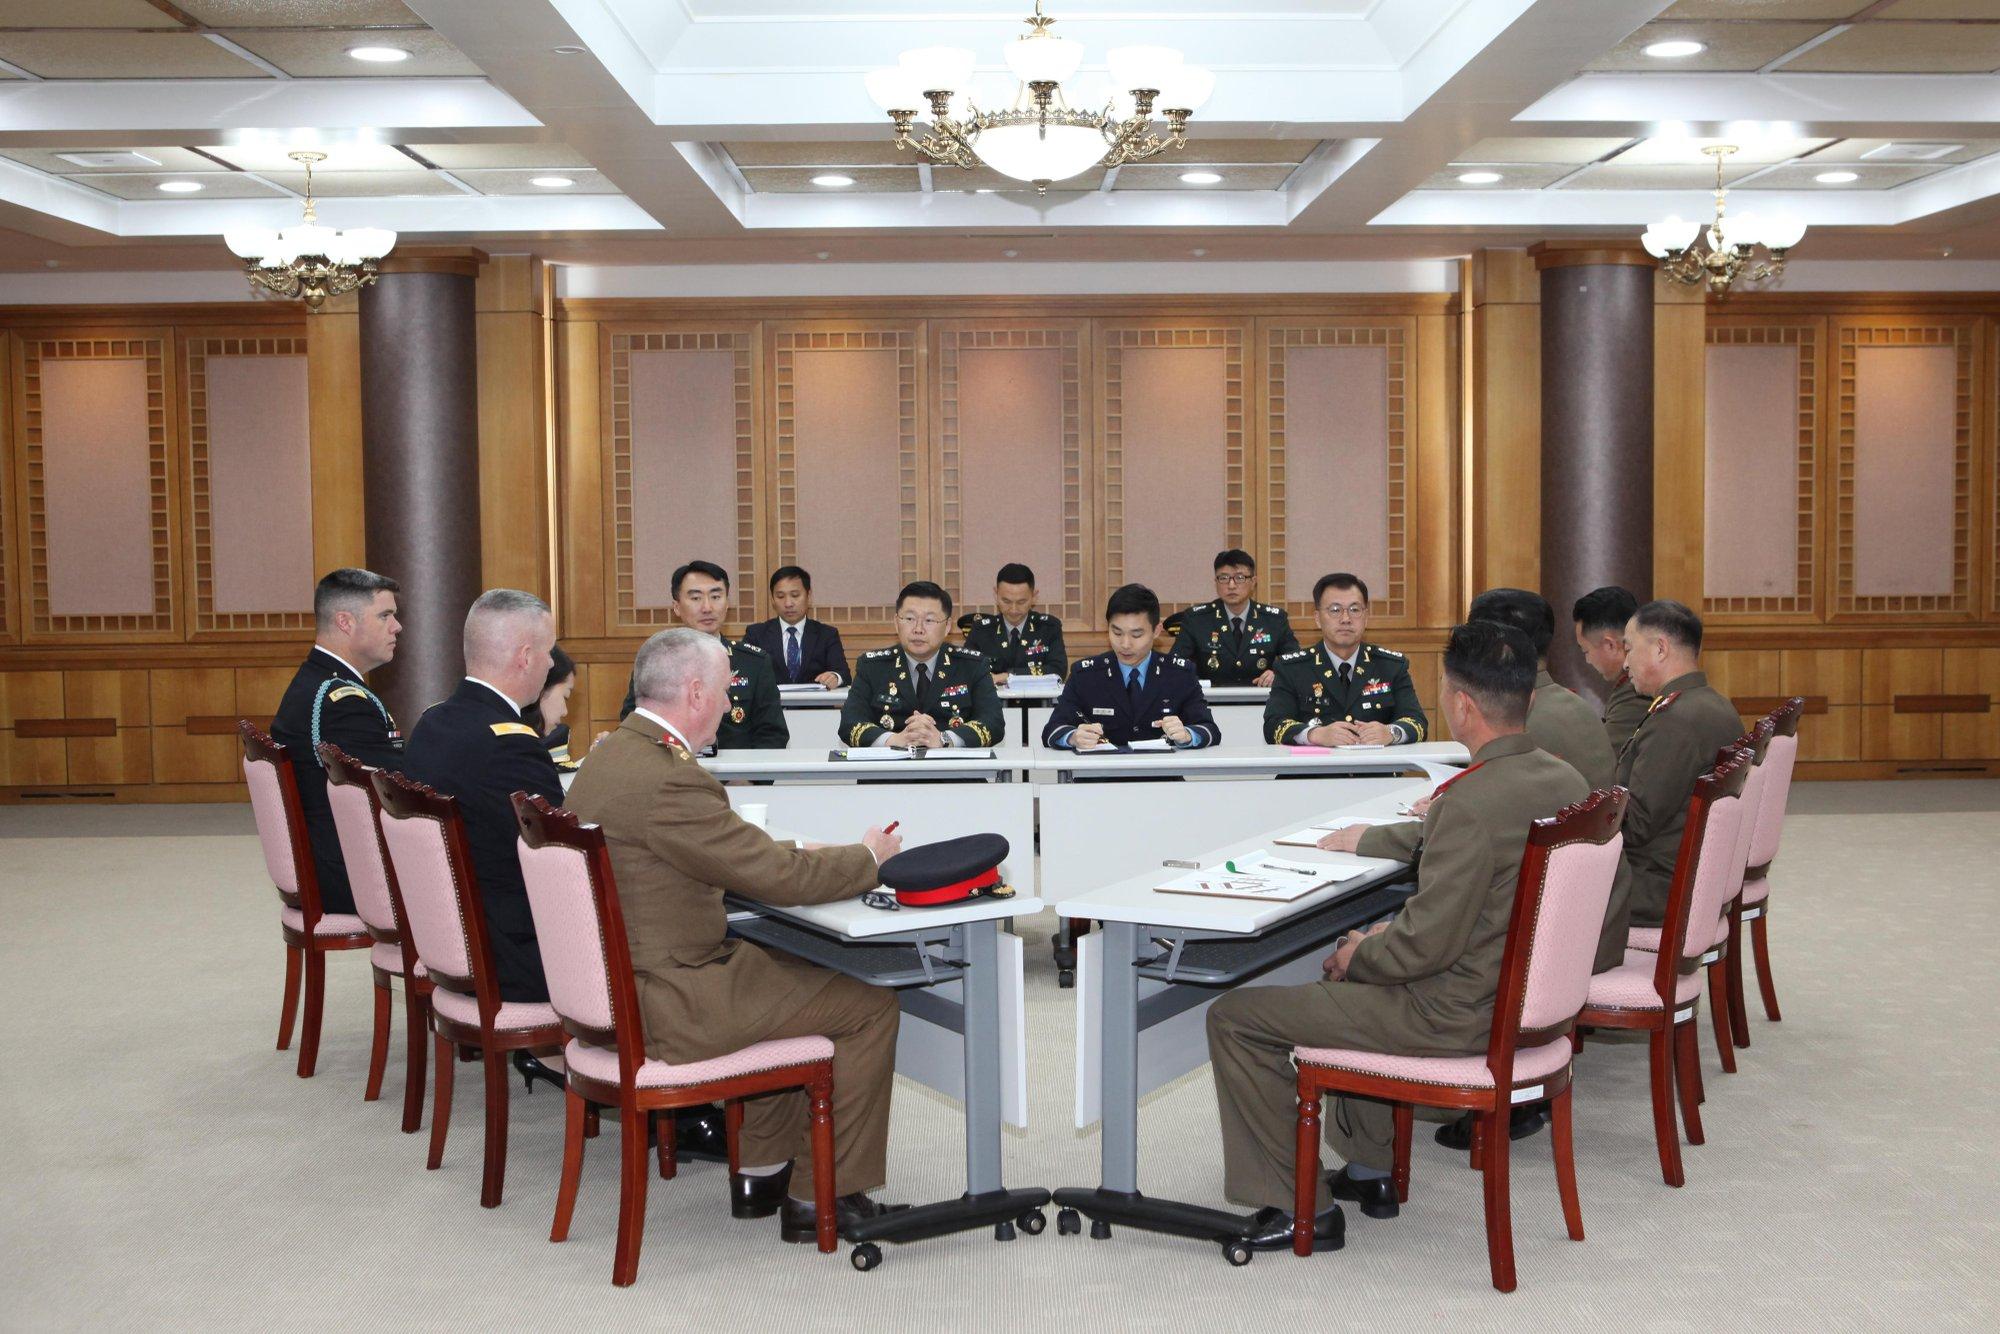 Hasil gambar untuk Koreas finish removing land mines from border village